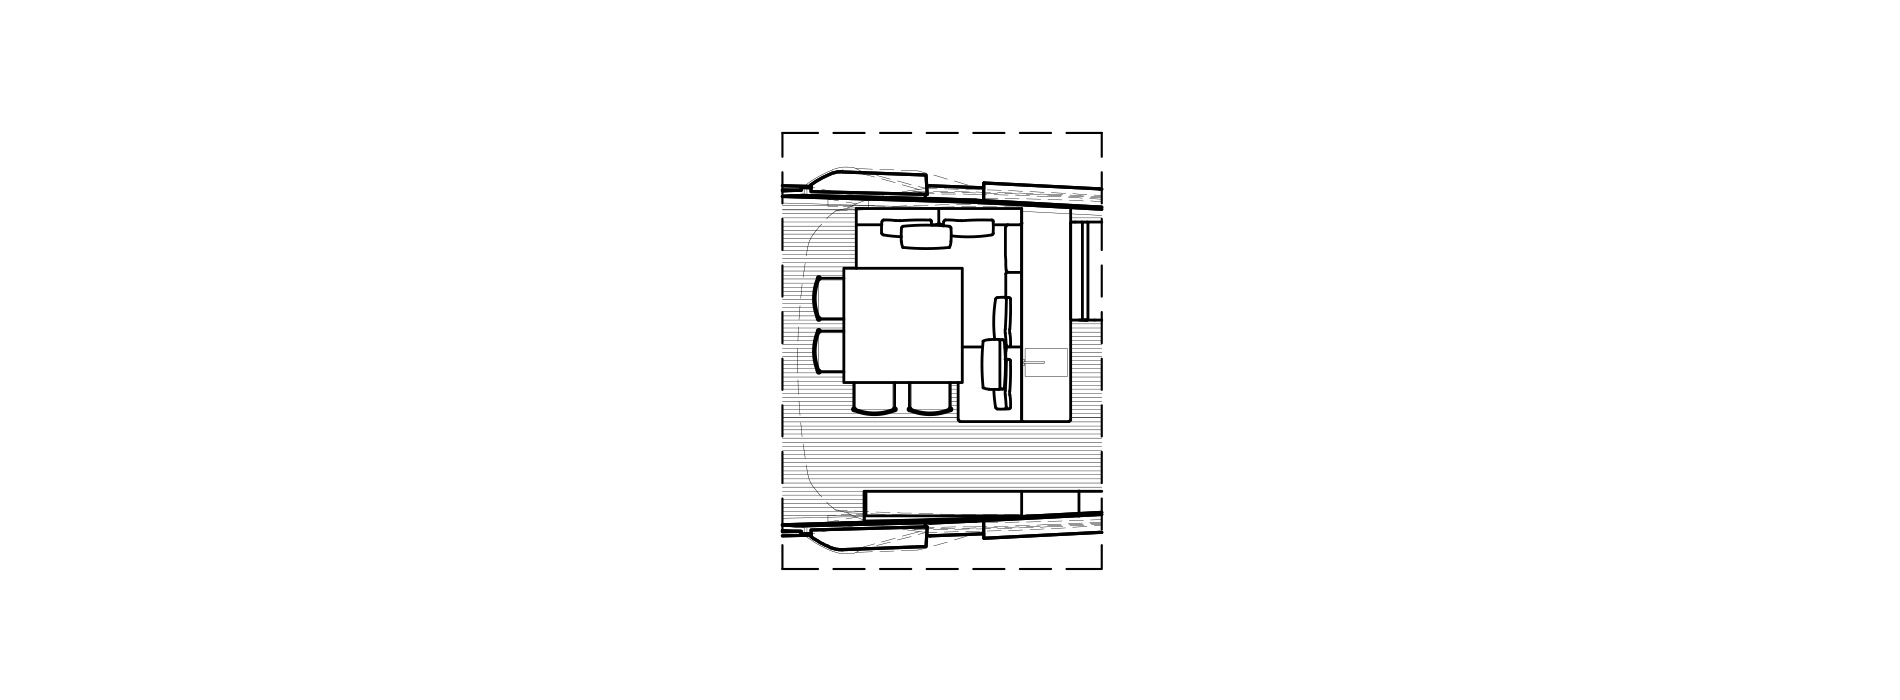 Sanlorenzo Yachts SX76 Detalles Versione Lissoni